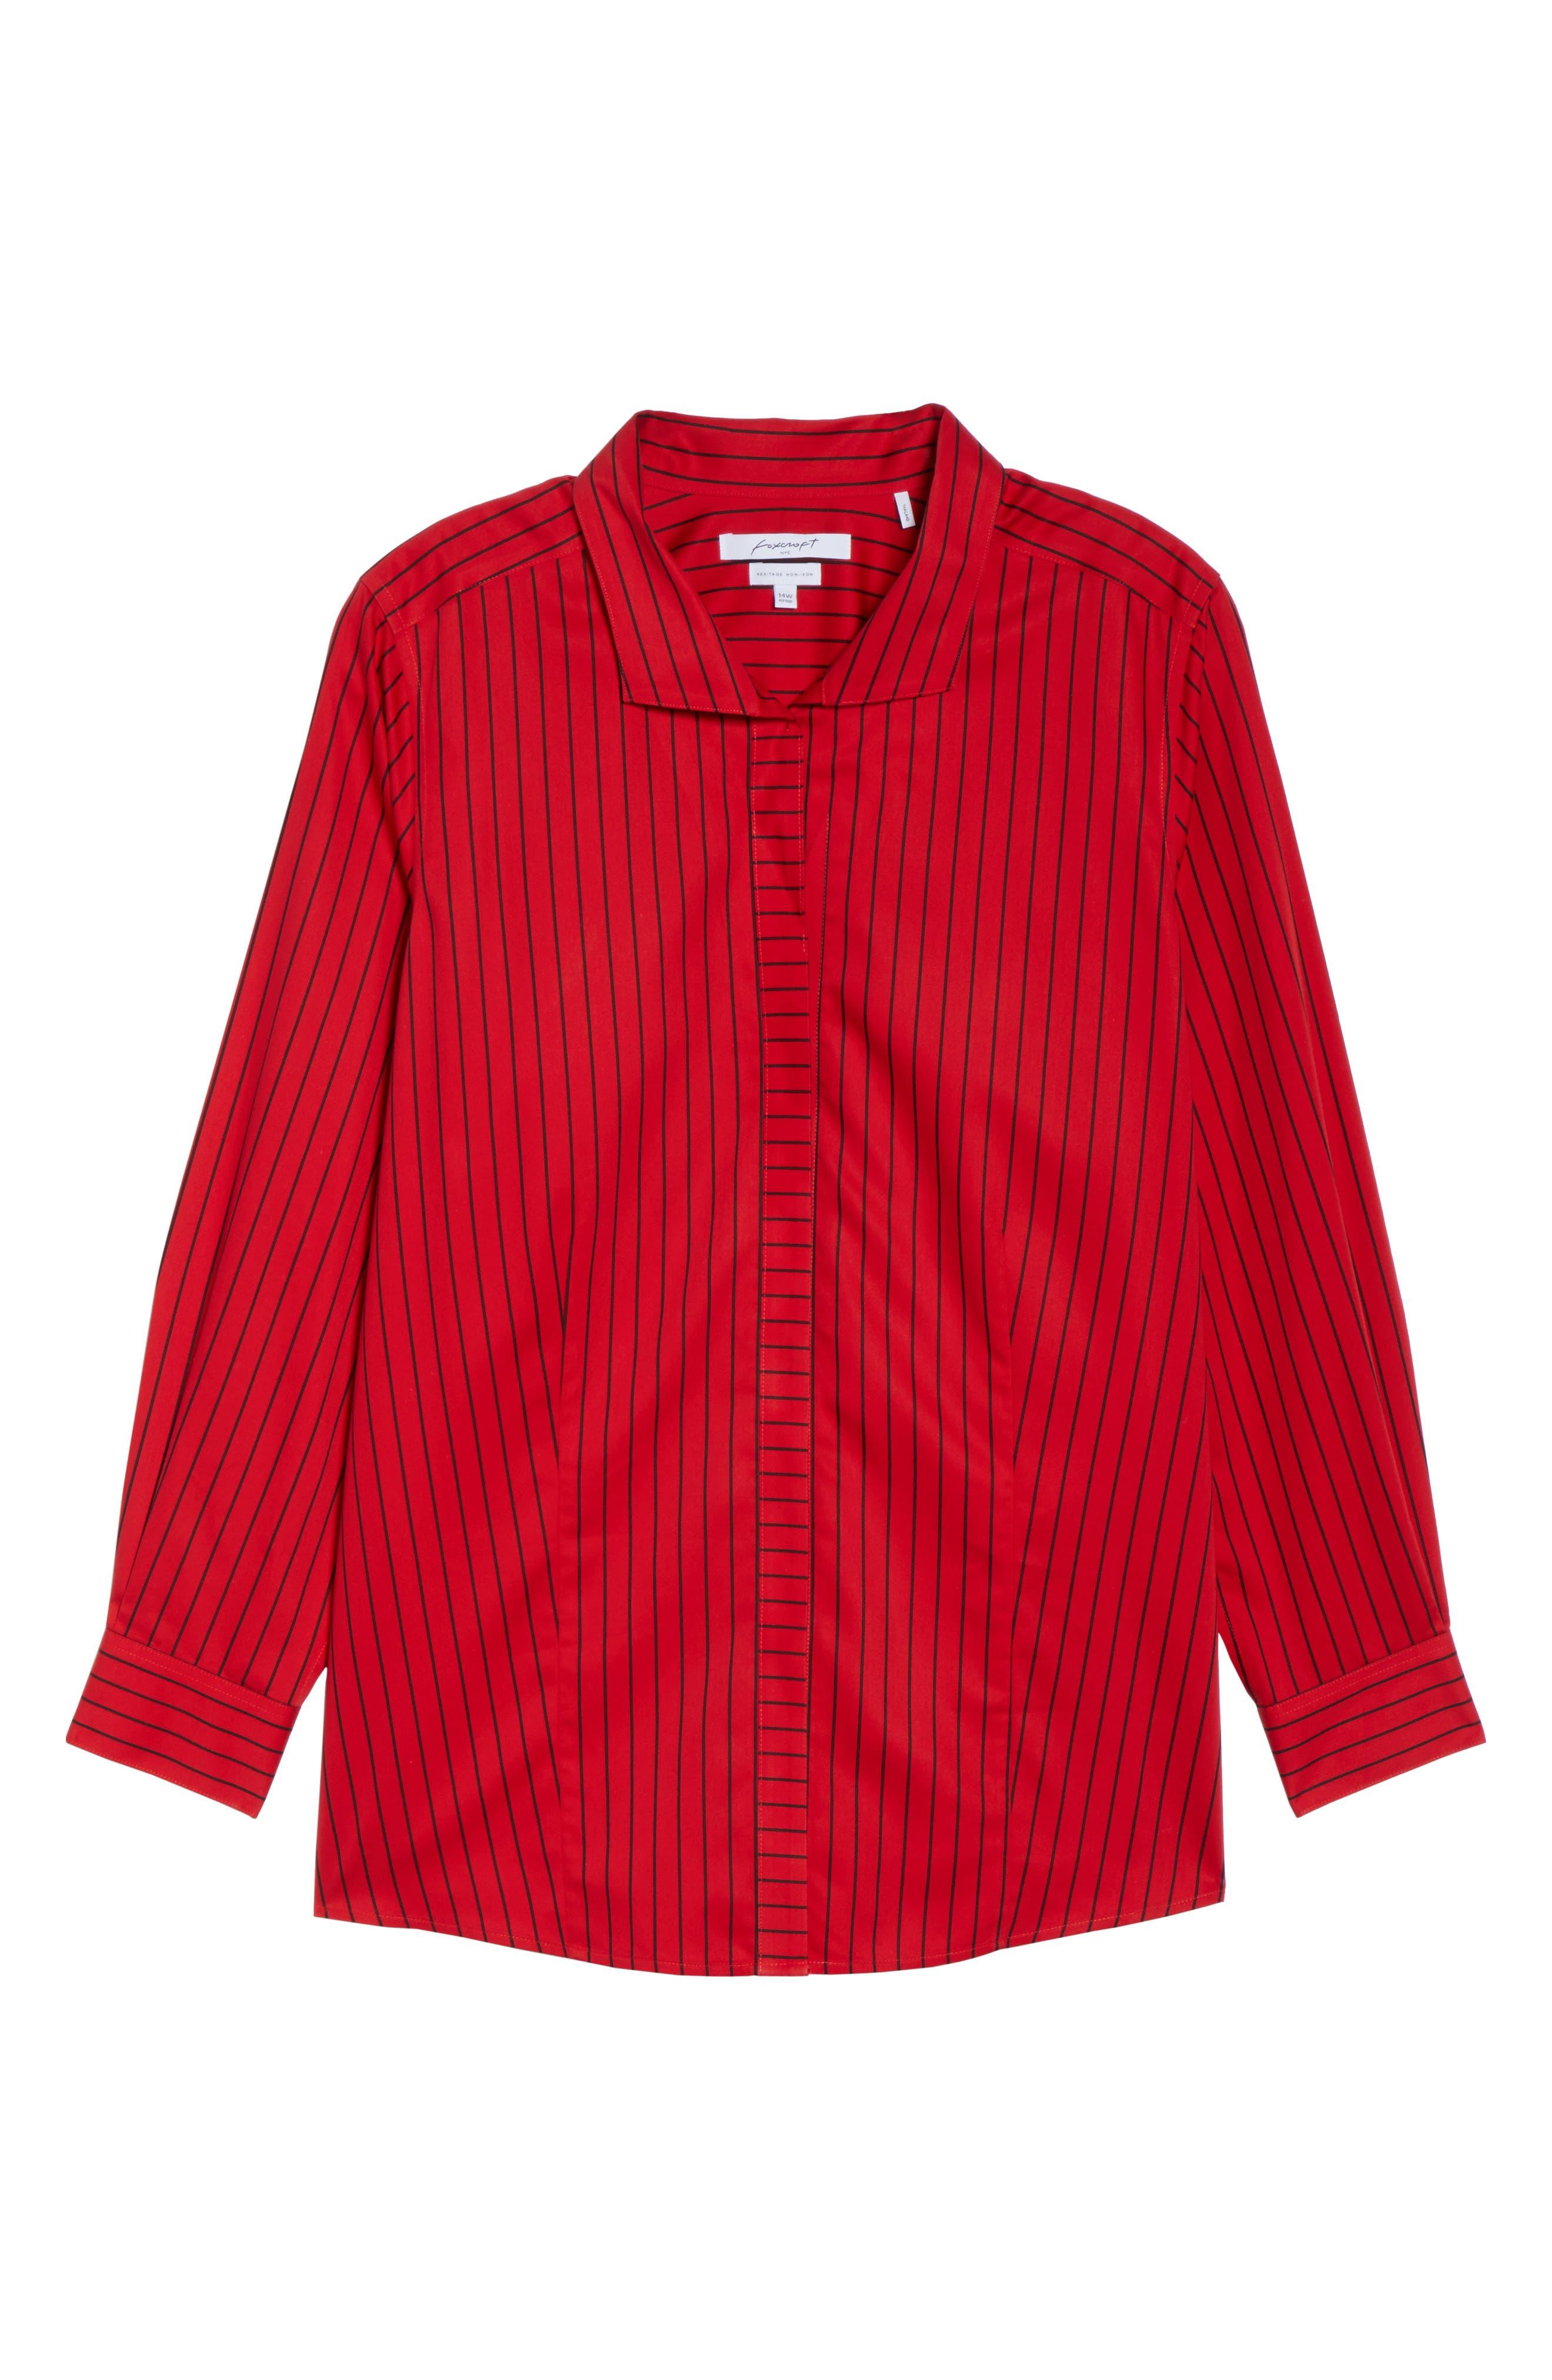 Annie Holiday Stripe Shirt,                             Alternate thumbnail 12, color,